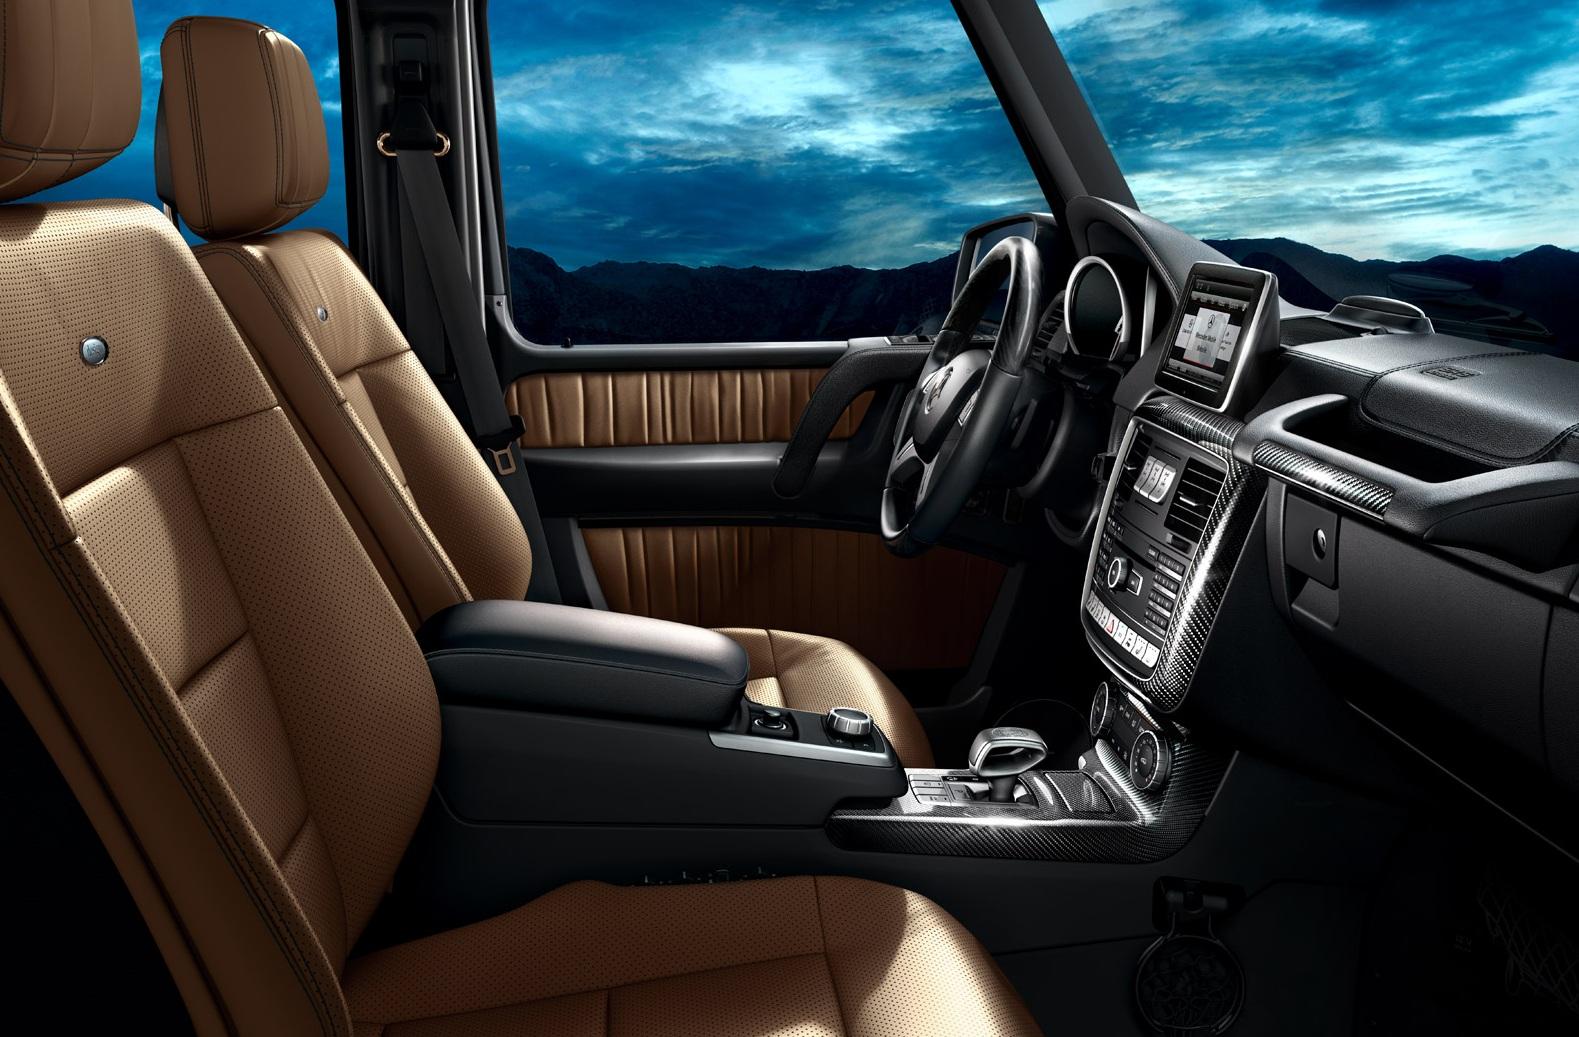 mercedes benz g class dash - G Wagon Interior